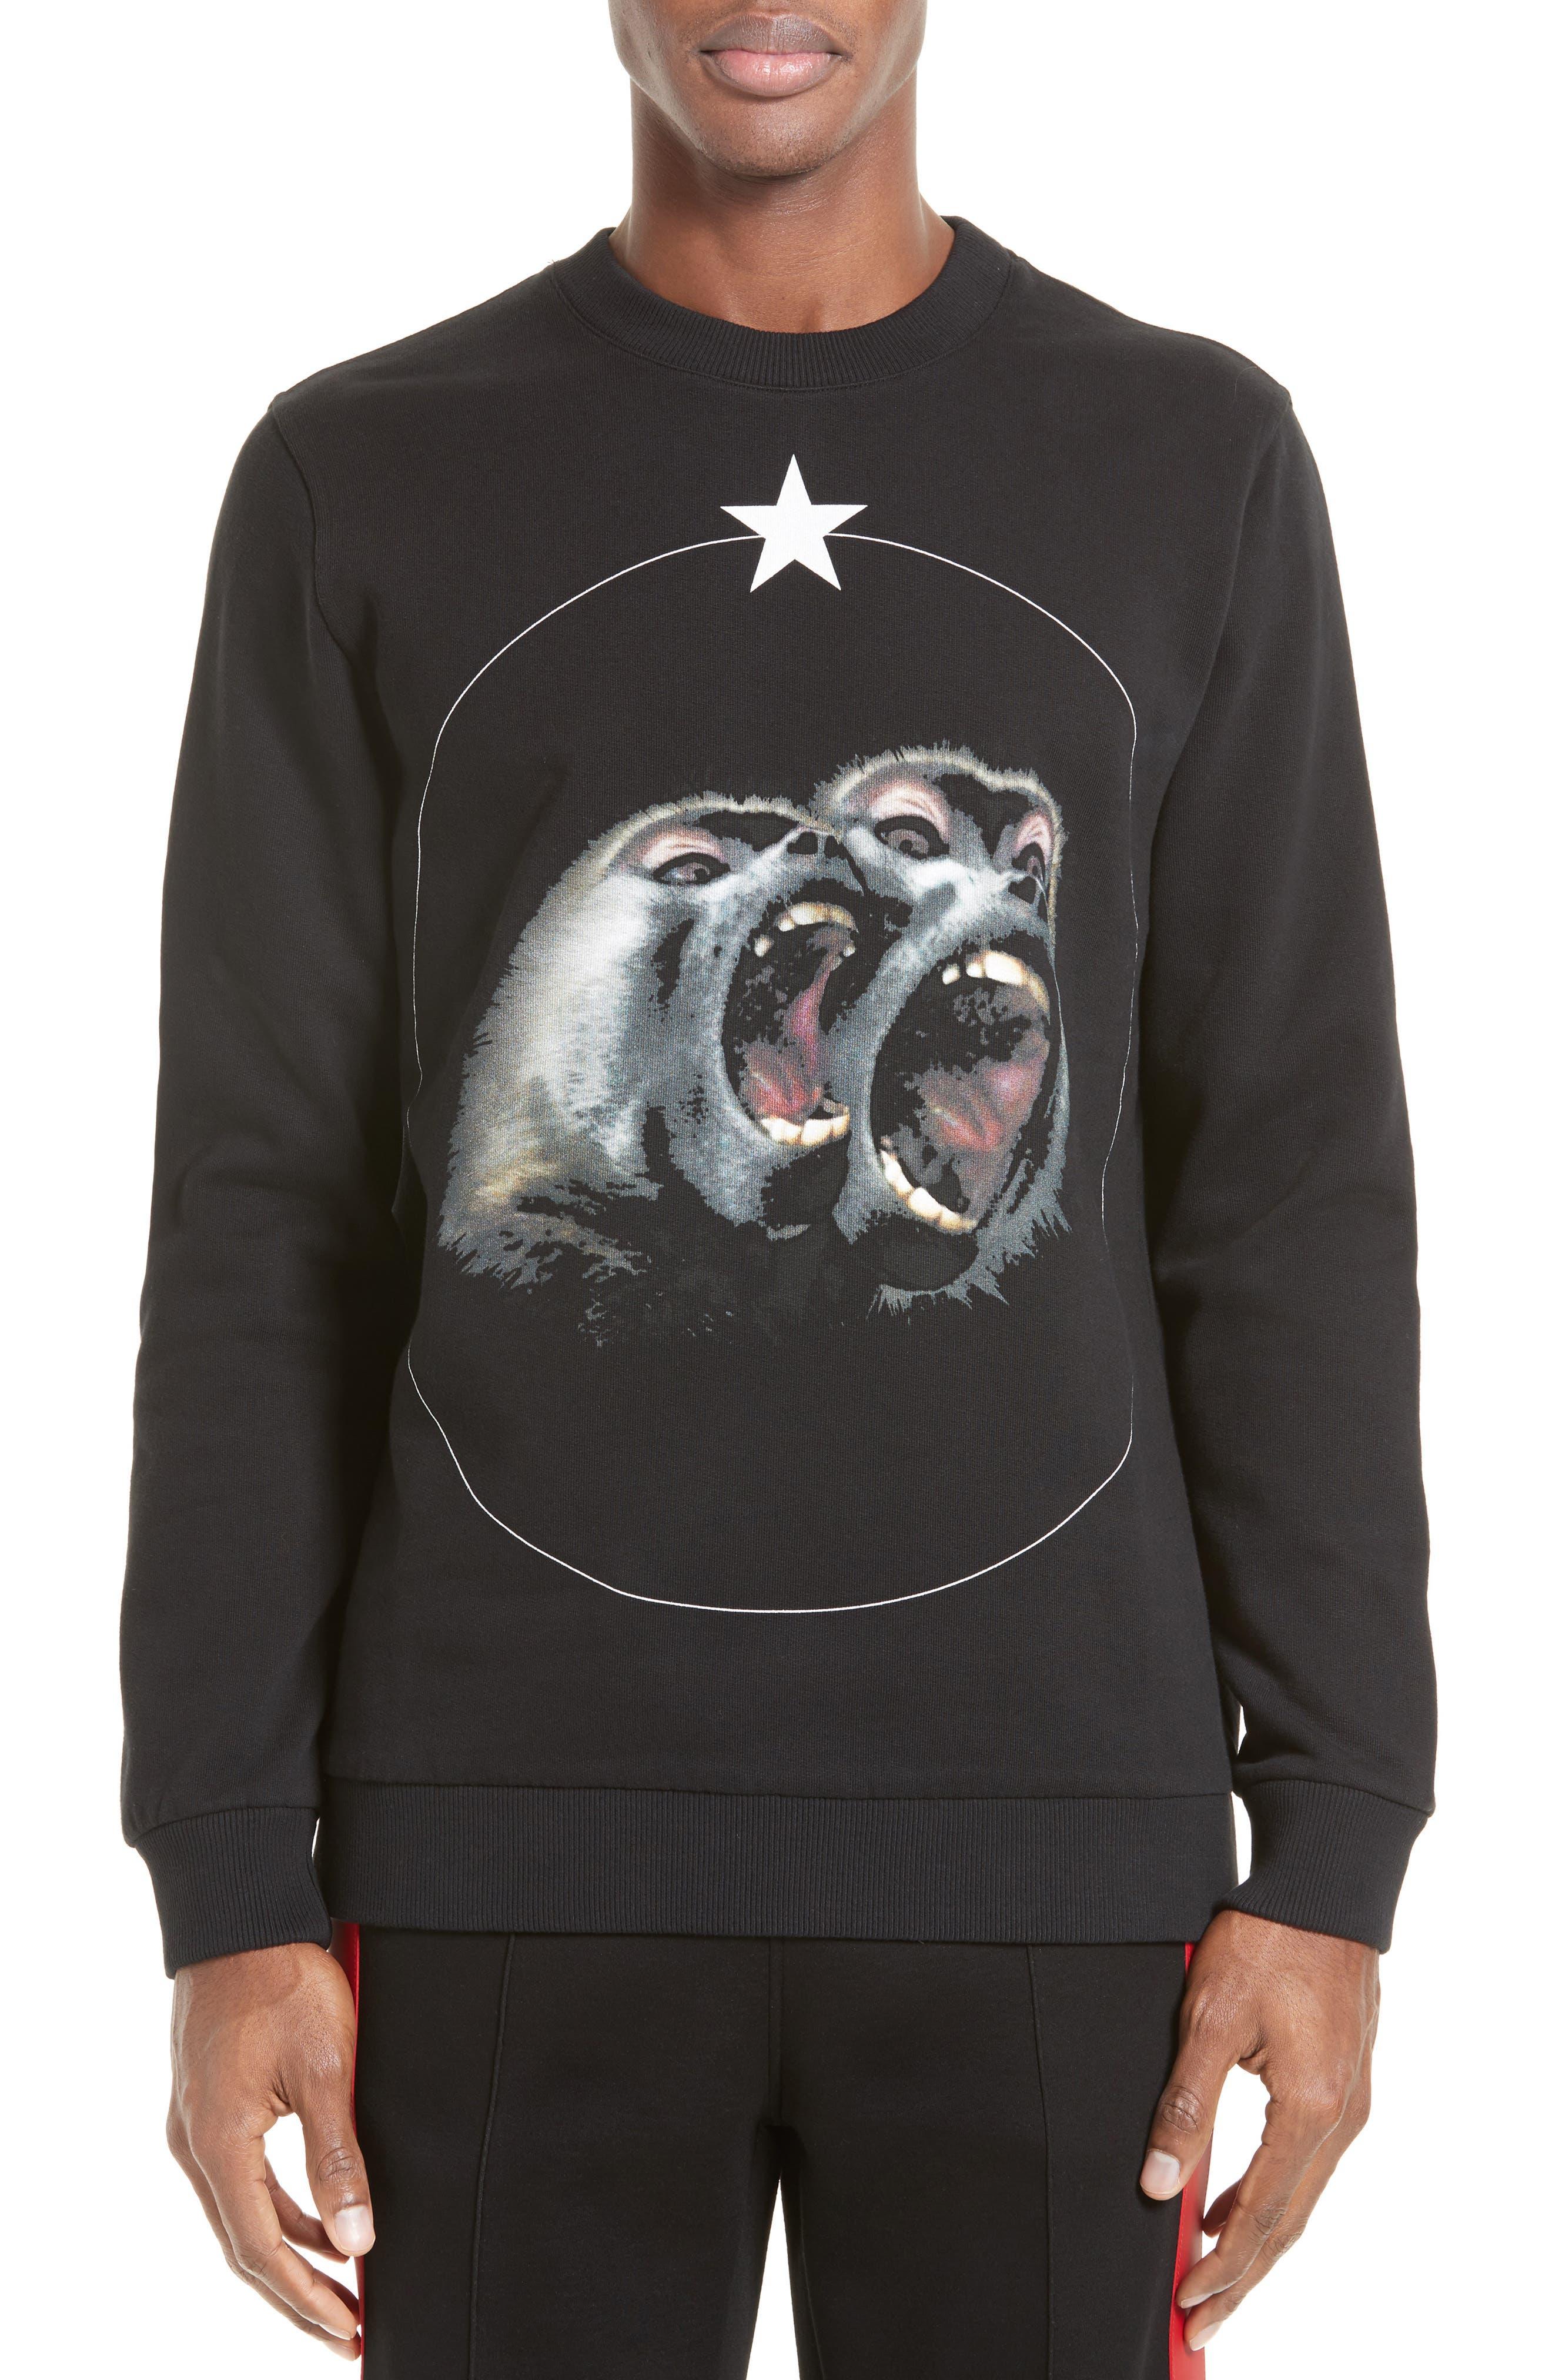 Monkey Brothers Graphic Sweatshirt,                             Main thumbnail 1, color,                             001